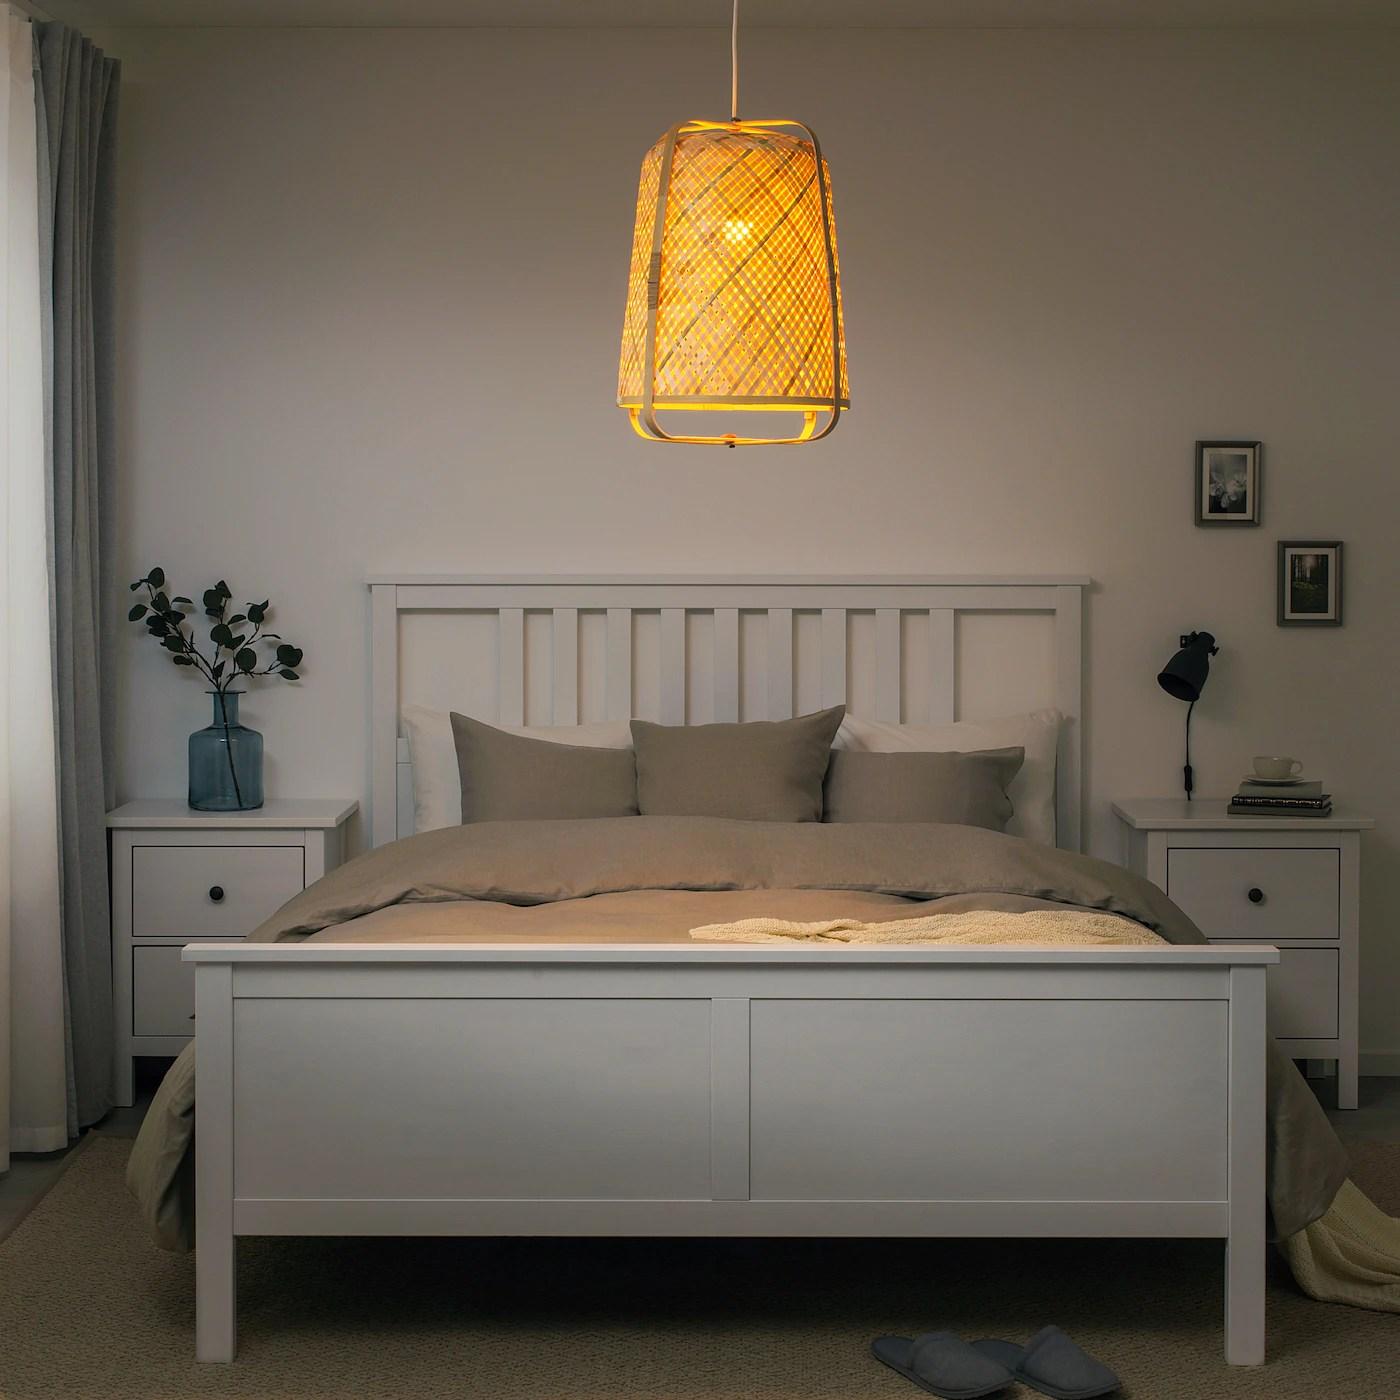 Knixhult Loftlampe Bambus Ikea